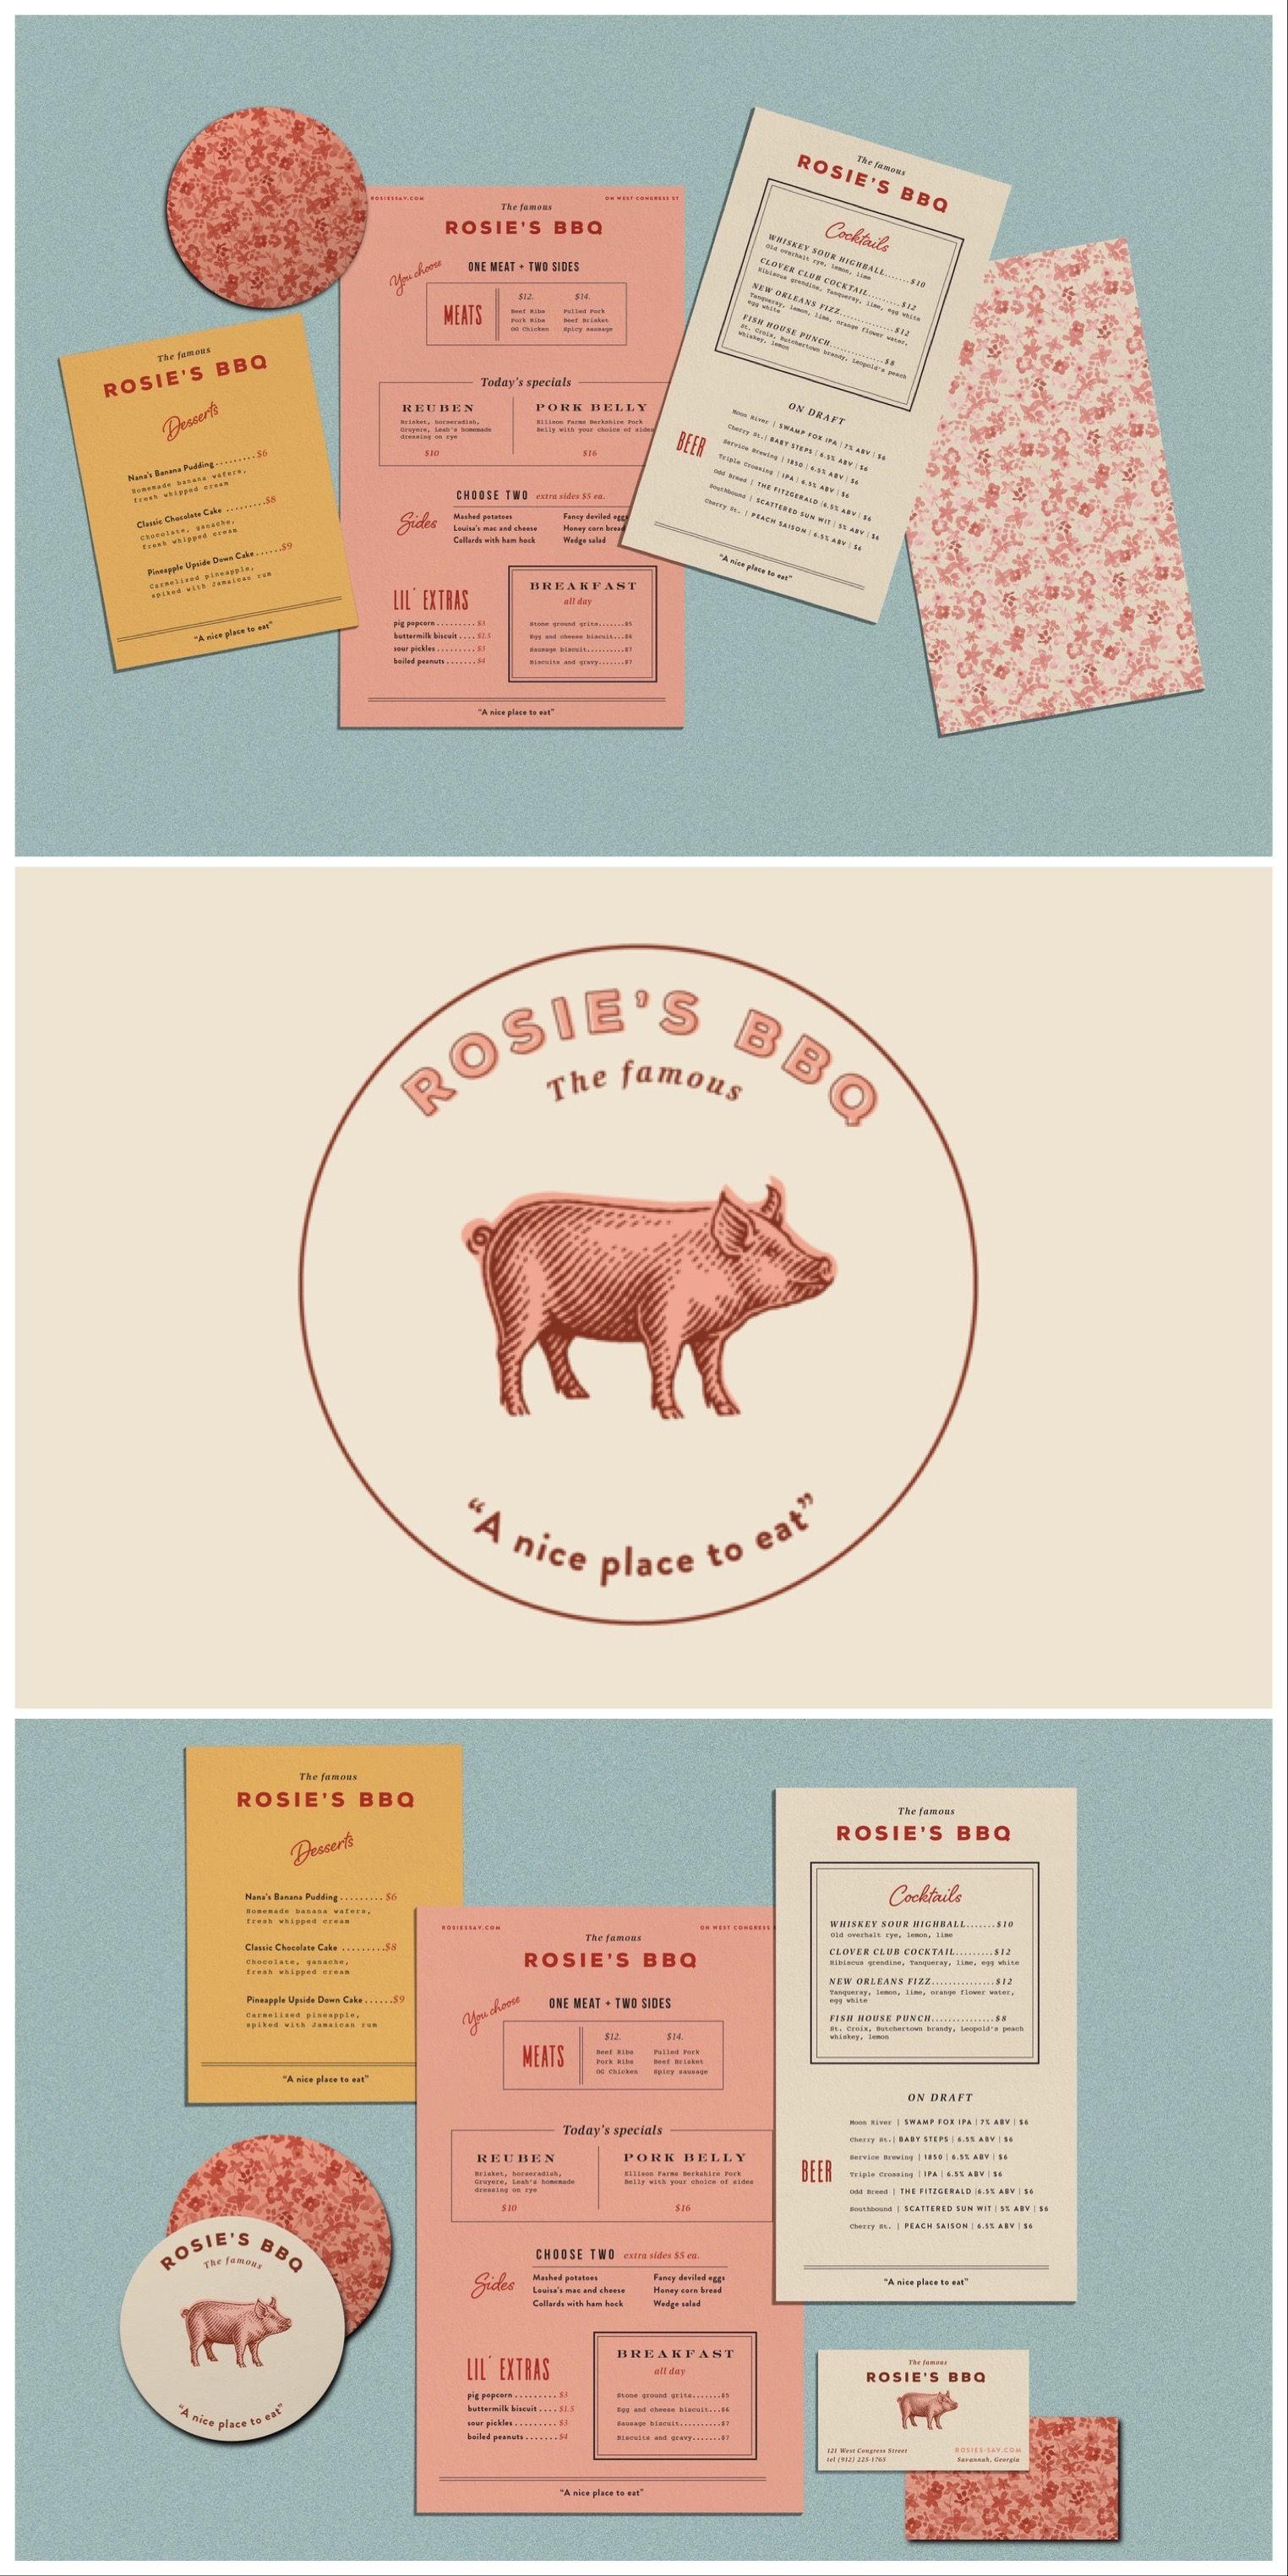 Rosie's BBQ brand design by Kendra Lebo  Rosie's BBQ brand design by Kendra Lebo | Fivestar Bra